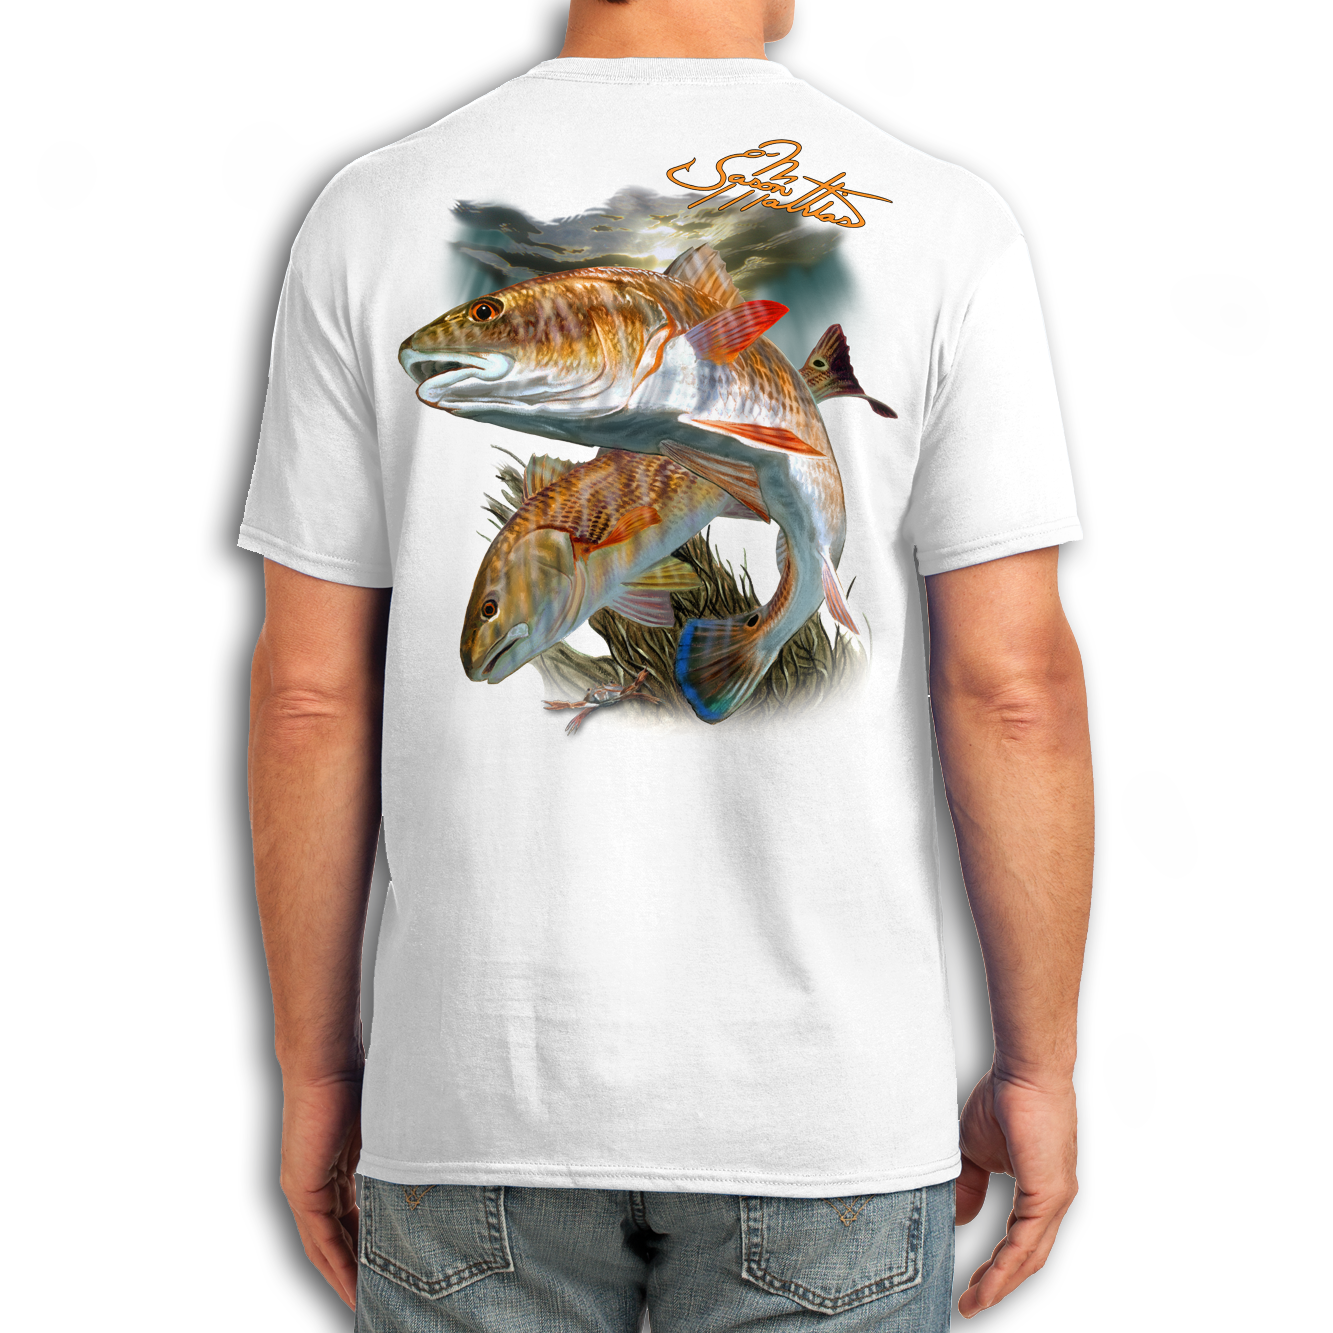 t-shirt-short-sleeve-white-jason-mathias-art-redfish.png